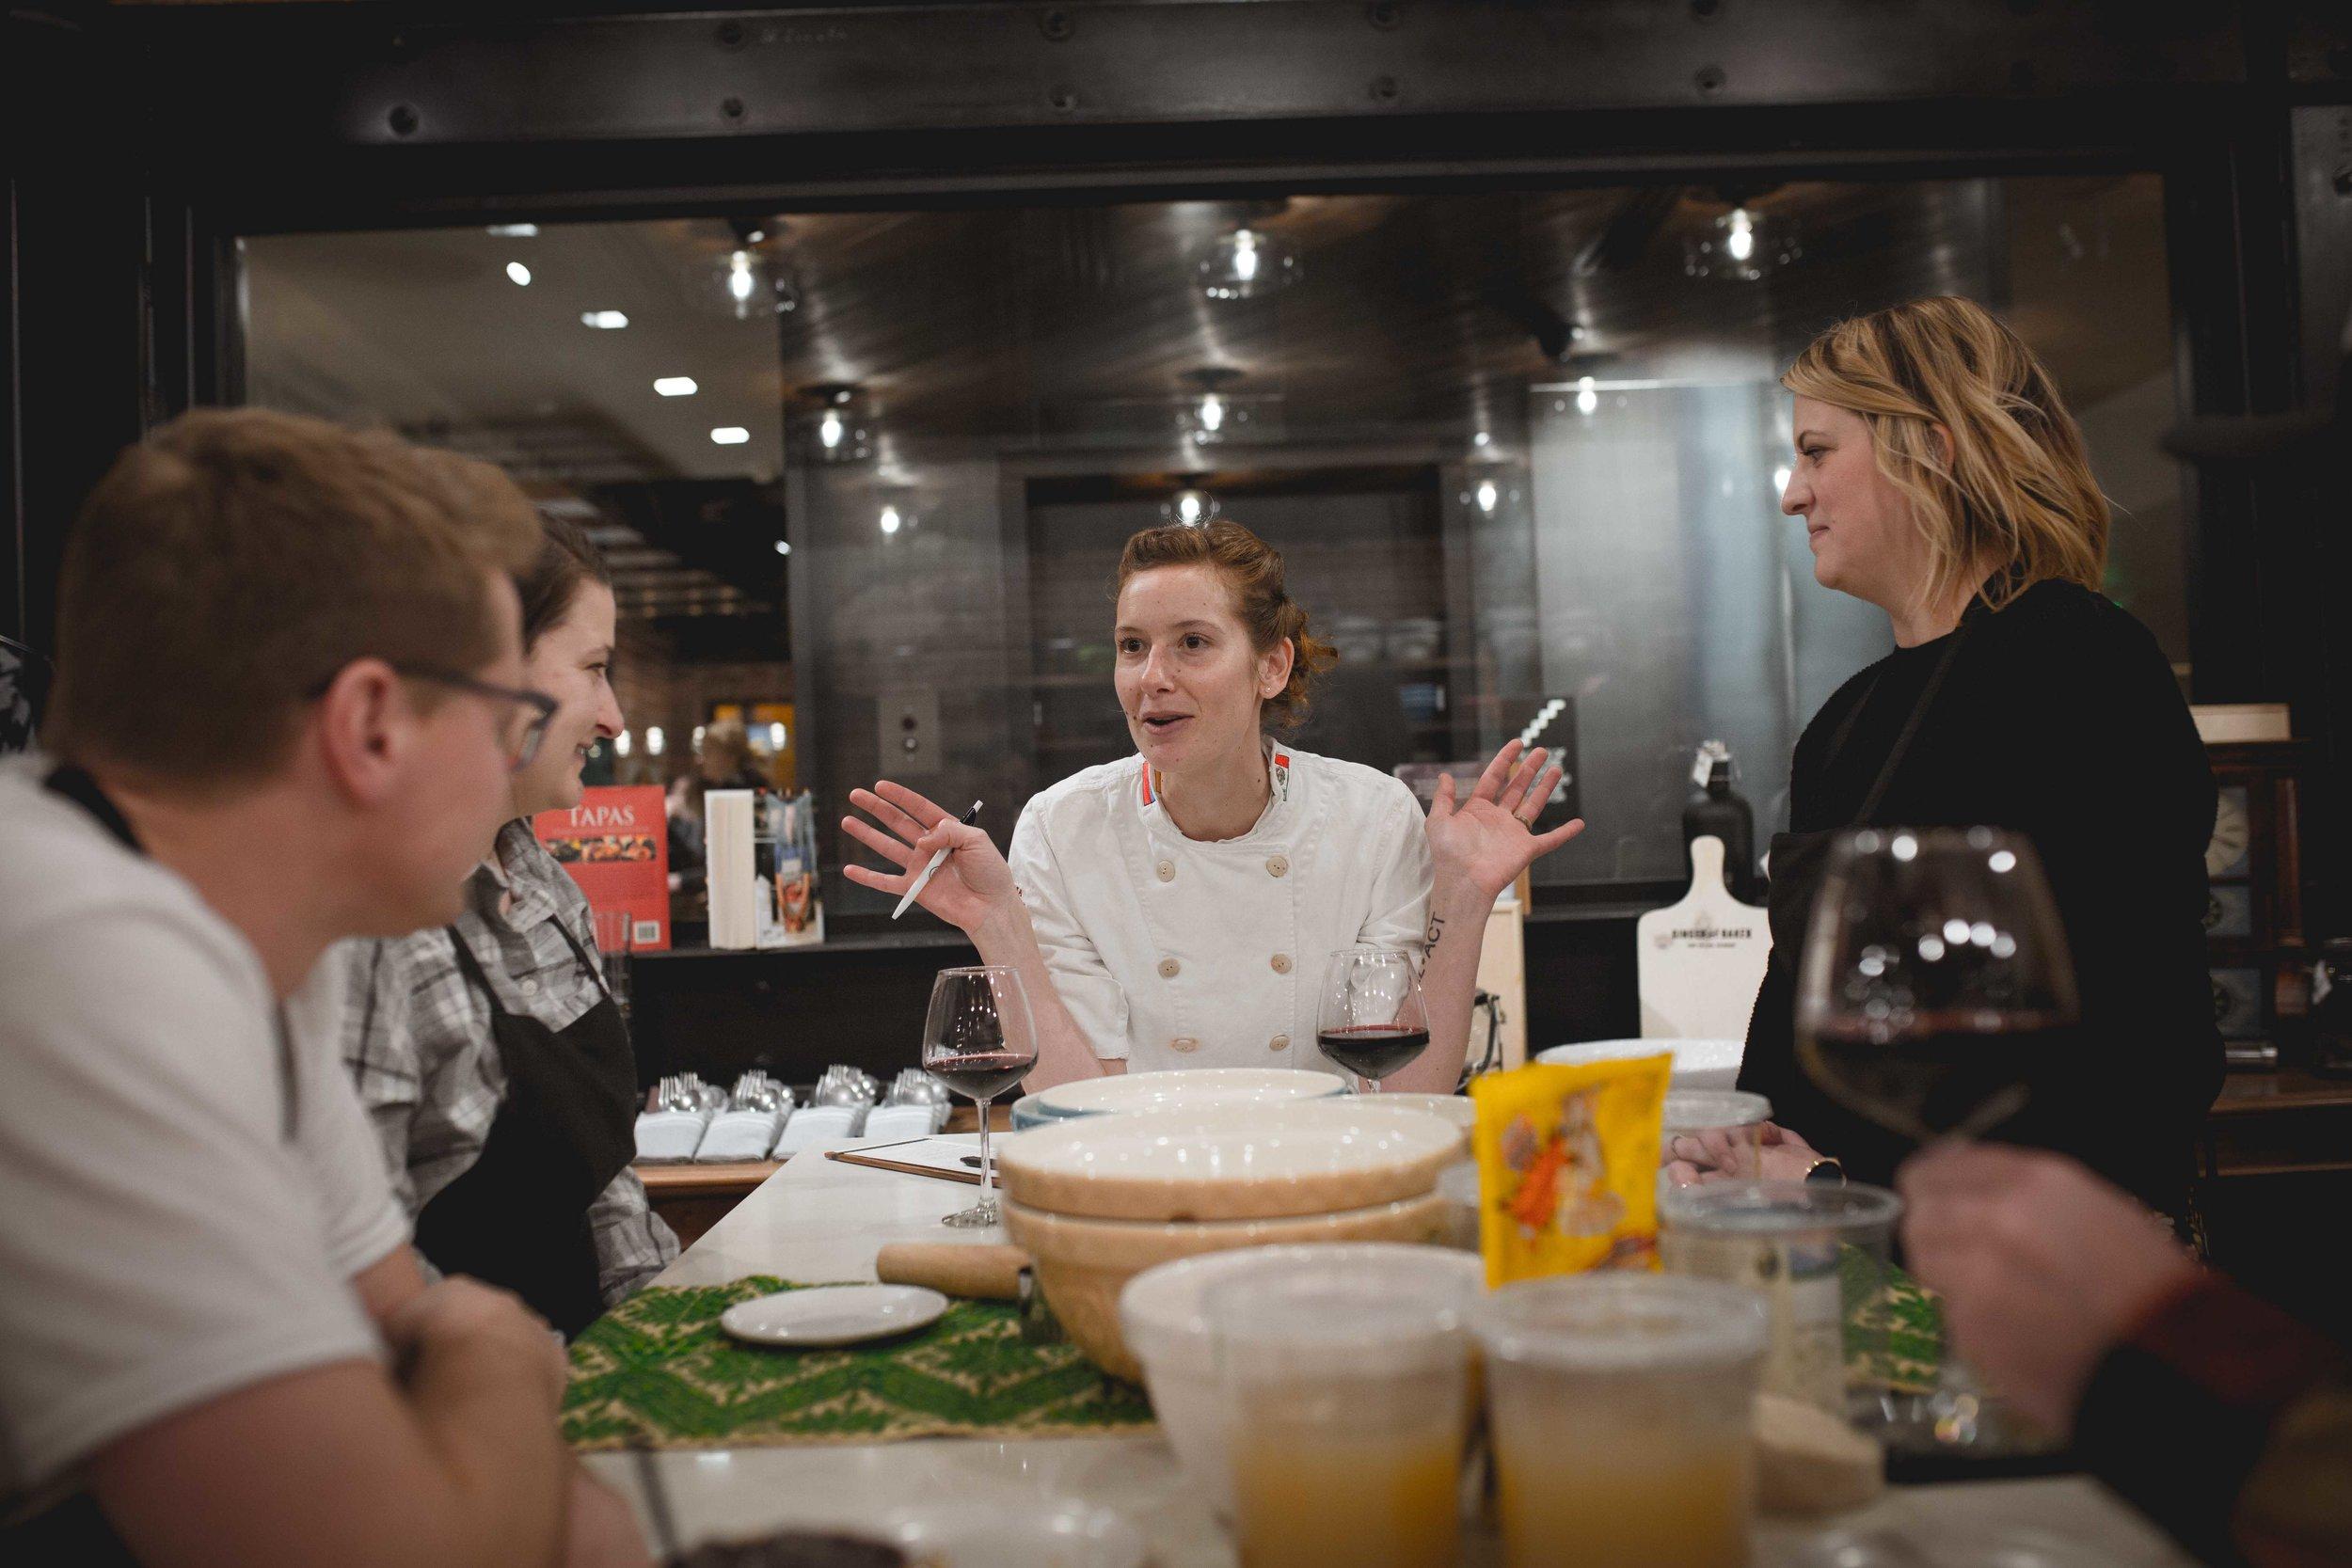 GingerandBaker-JuliyJuan-CookingClass-Feb28-24.jpg